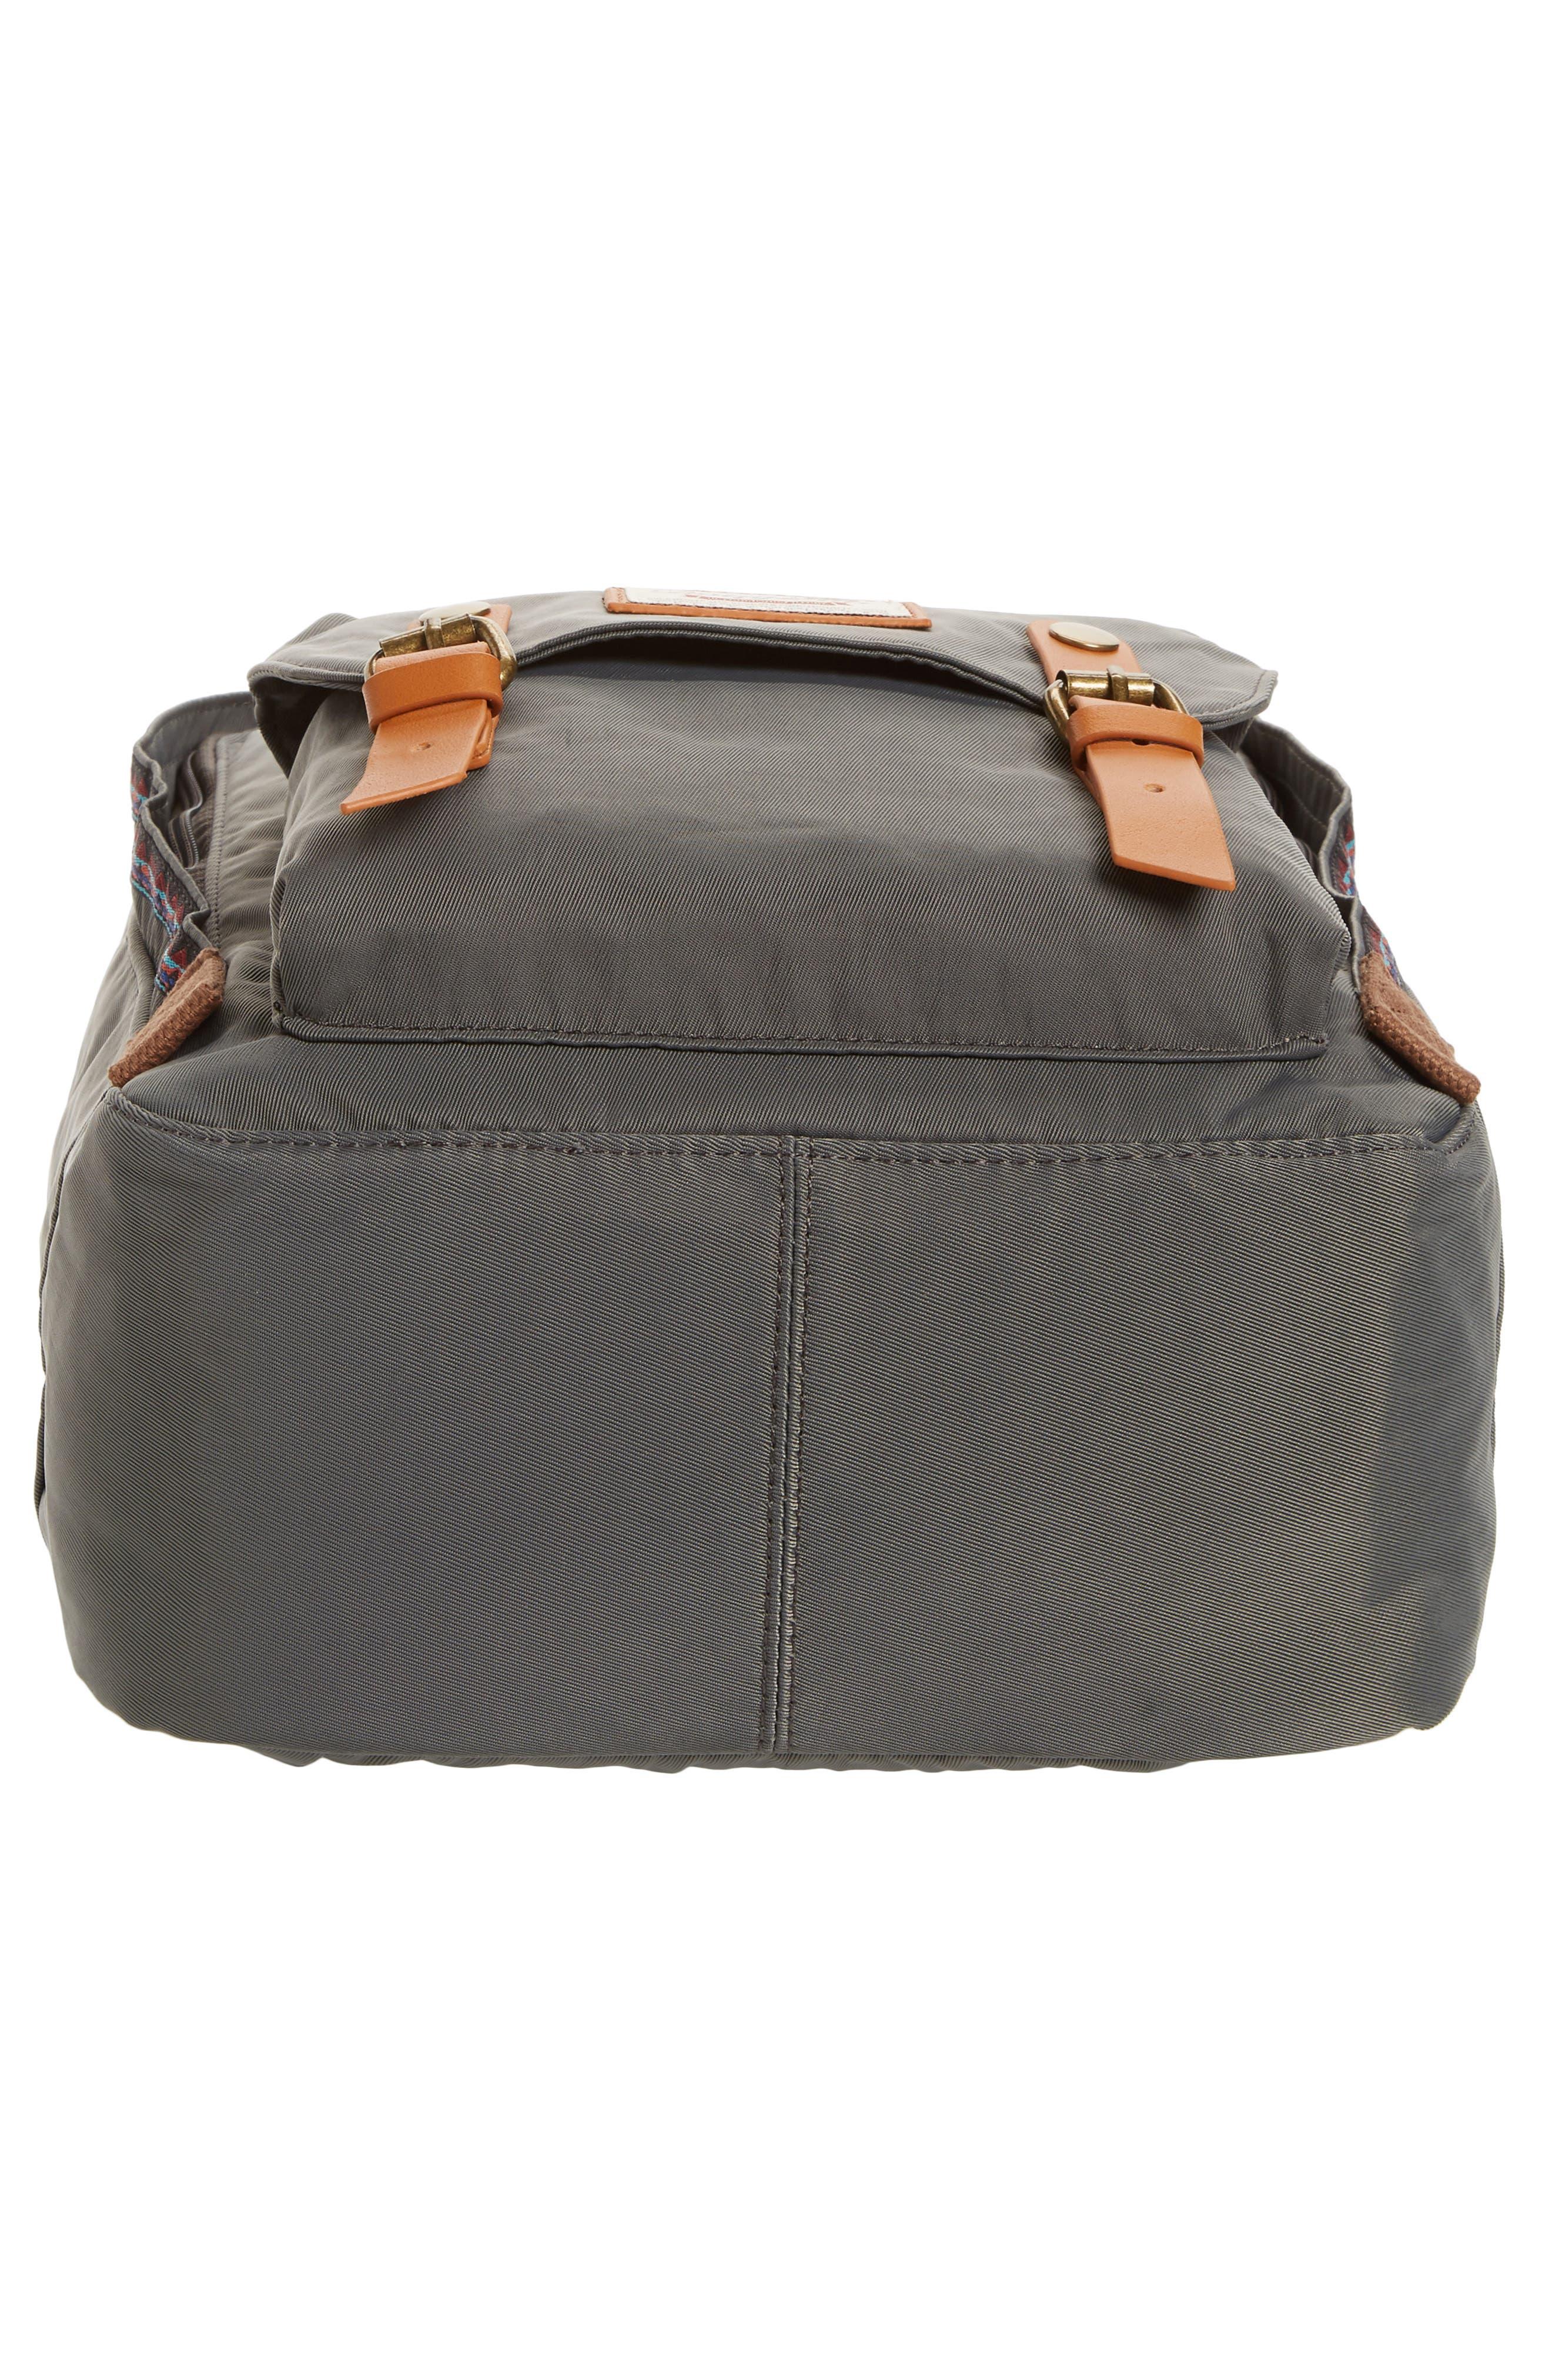 Macaroon Bo-He Water Resistant Backpack,                             Alternate thumbnail 6, color,                             CHARCOAL